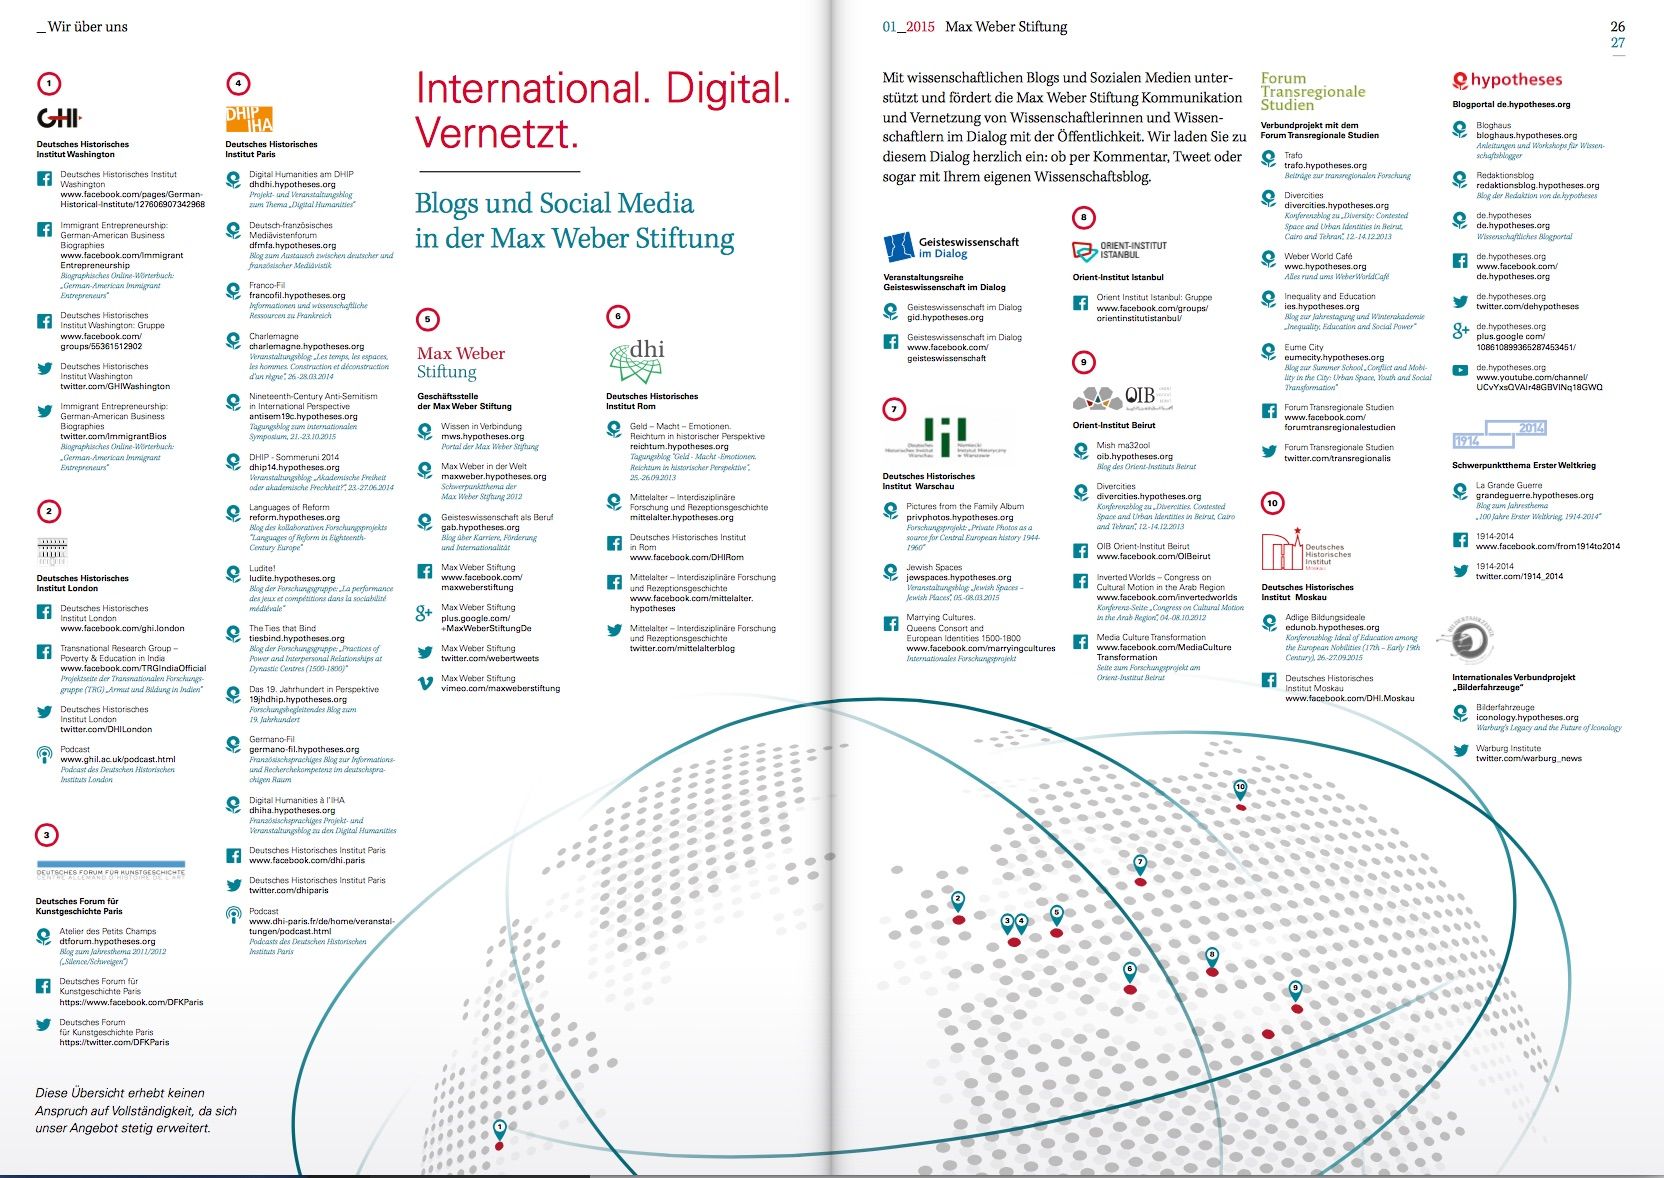 Berufsperspektiven als Geisteswissenschaftler im digitalen Zeitalter